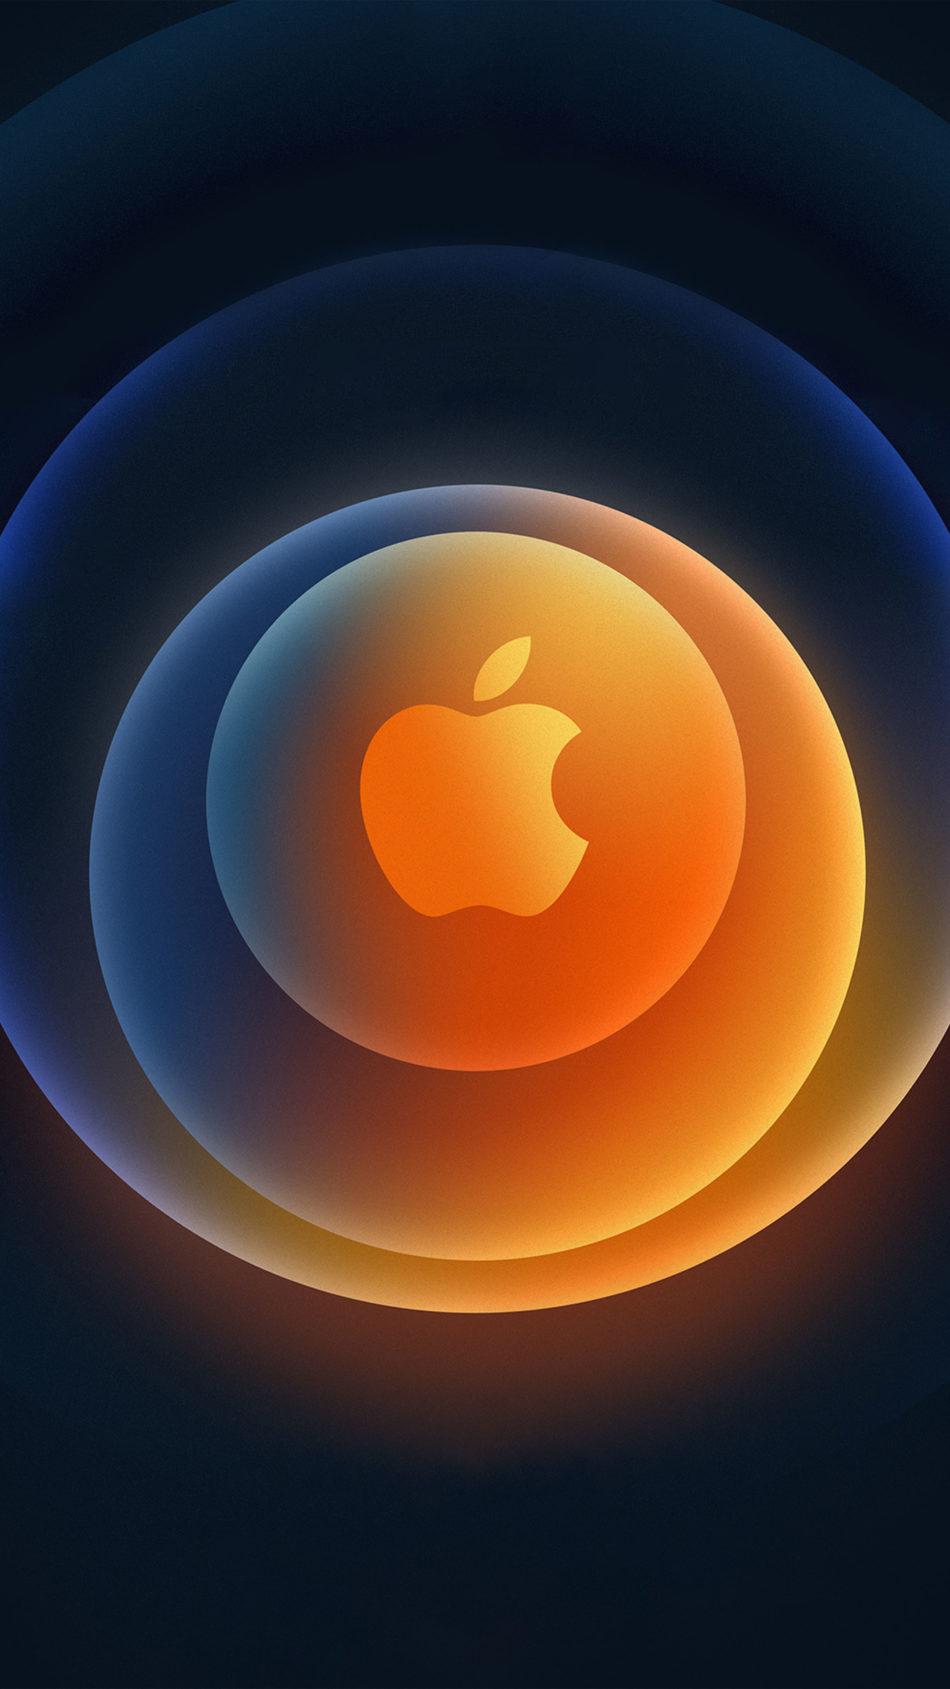 Iphone 12 Logo 4k Ultra Hd Mobile Wallpaper